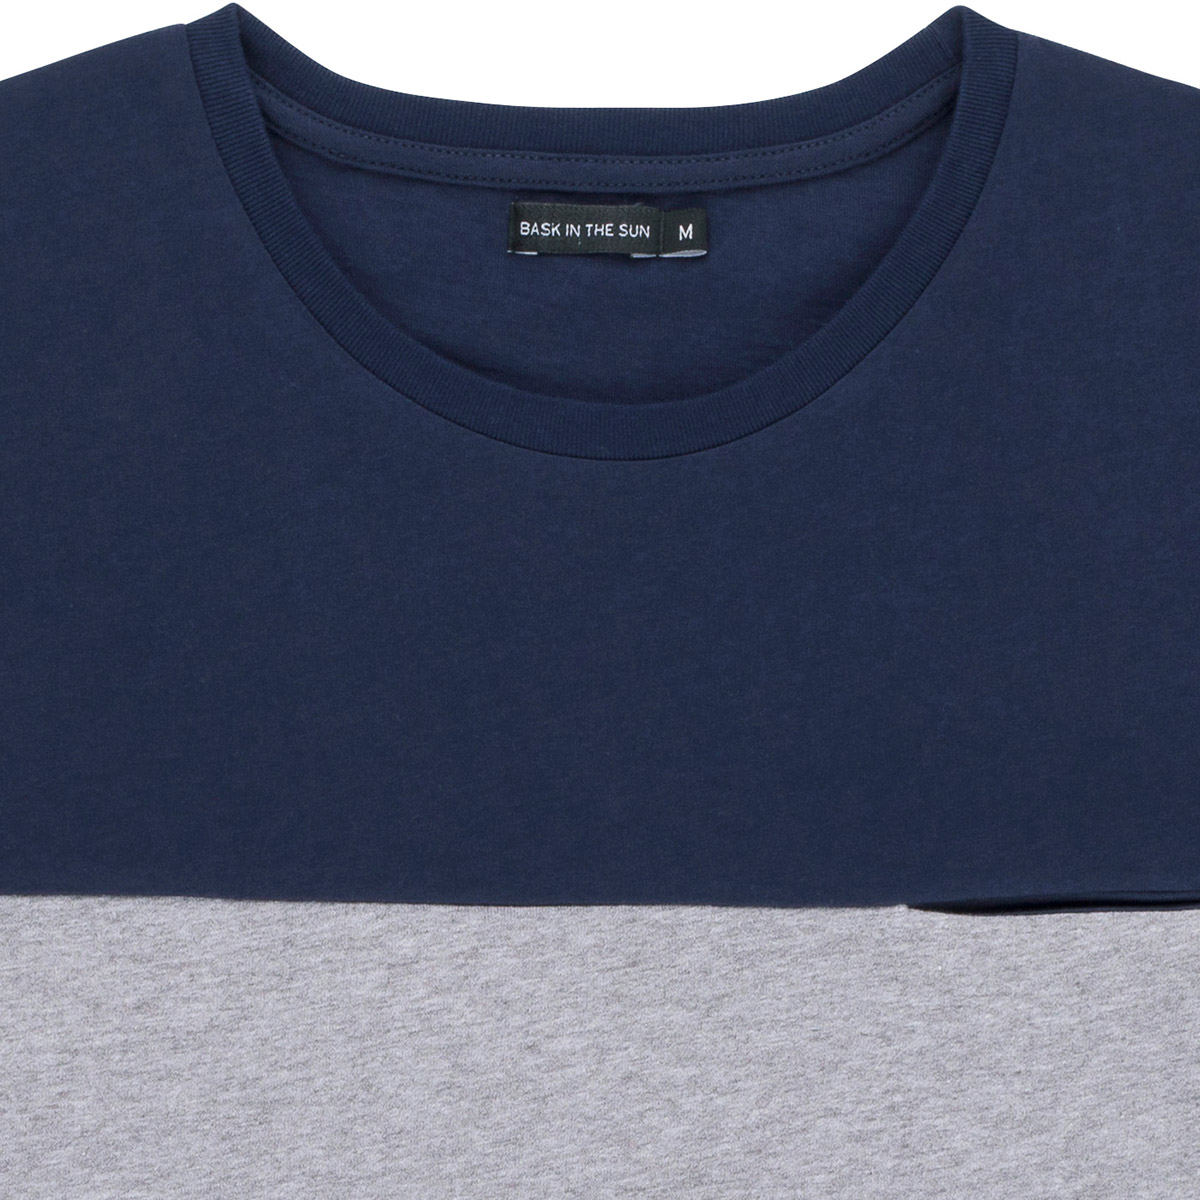 T-shirt en coton bio teofilo - Bask in the Sun num 1